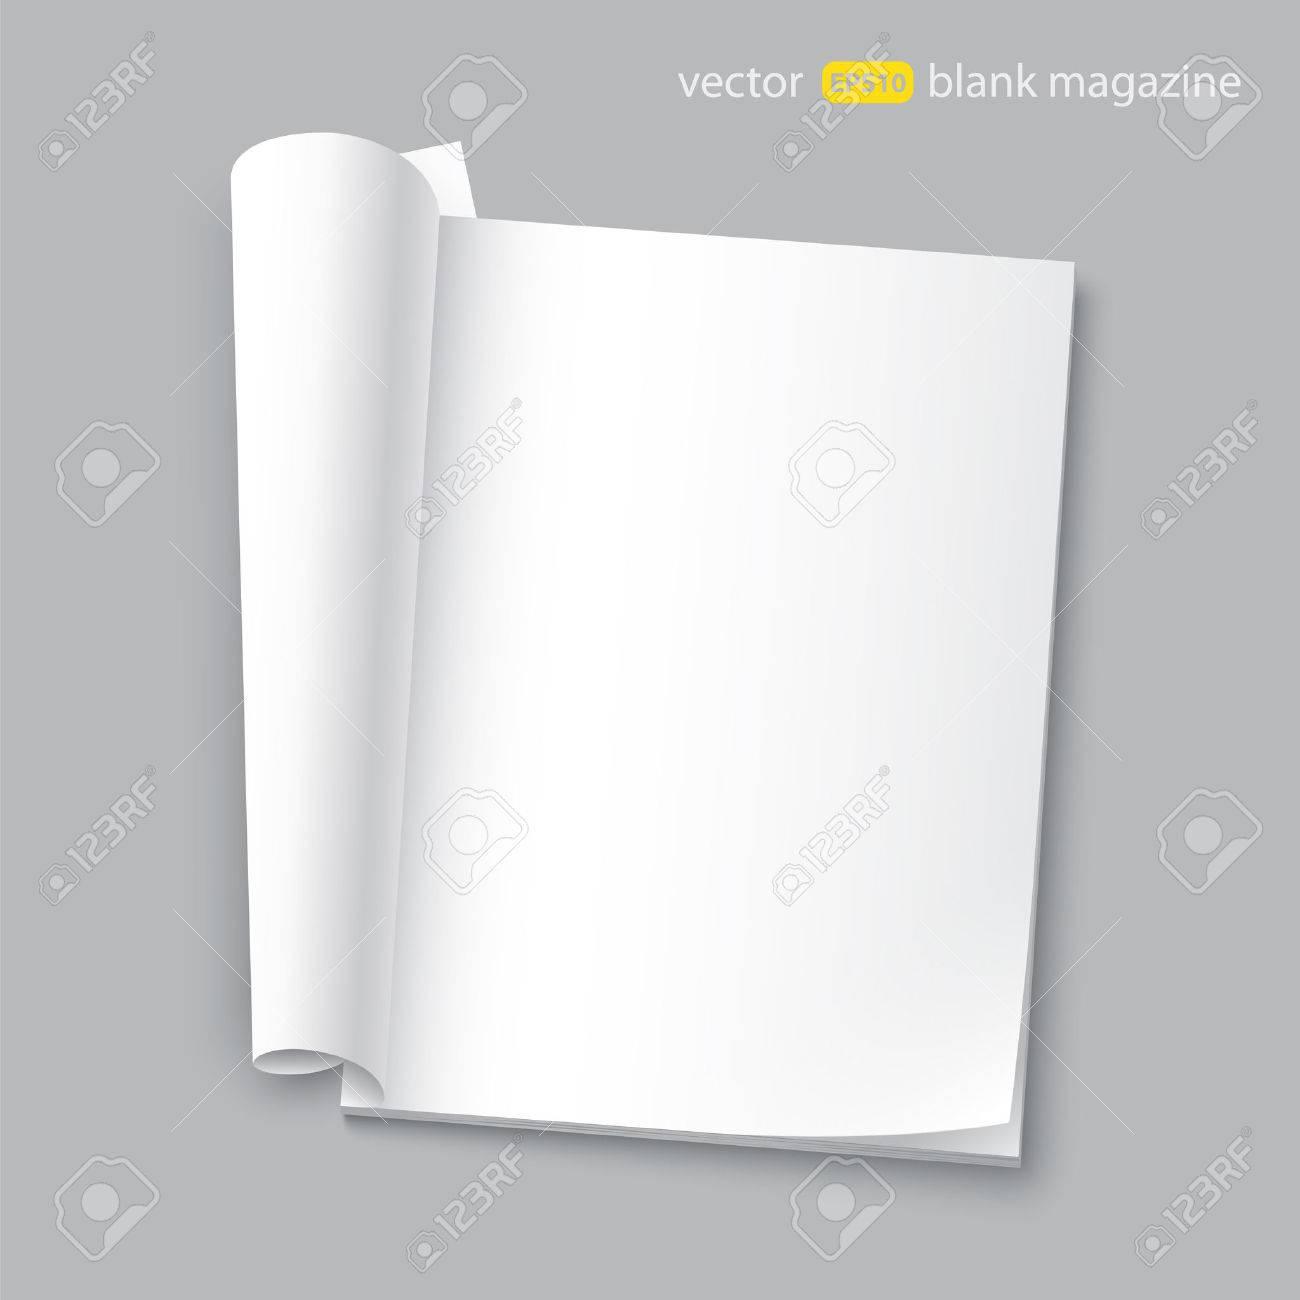 blank magazine with transparent shadows - 29413593